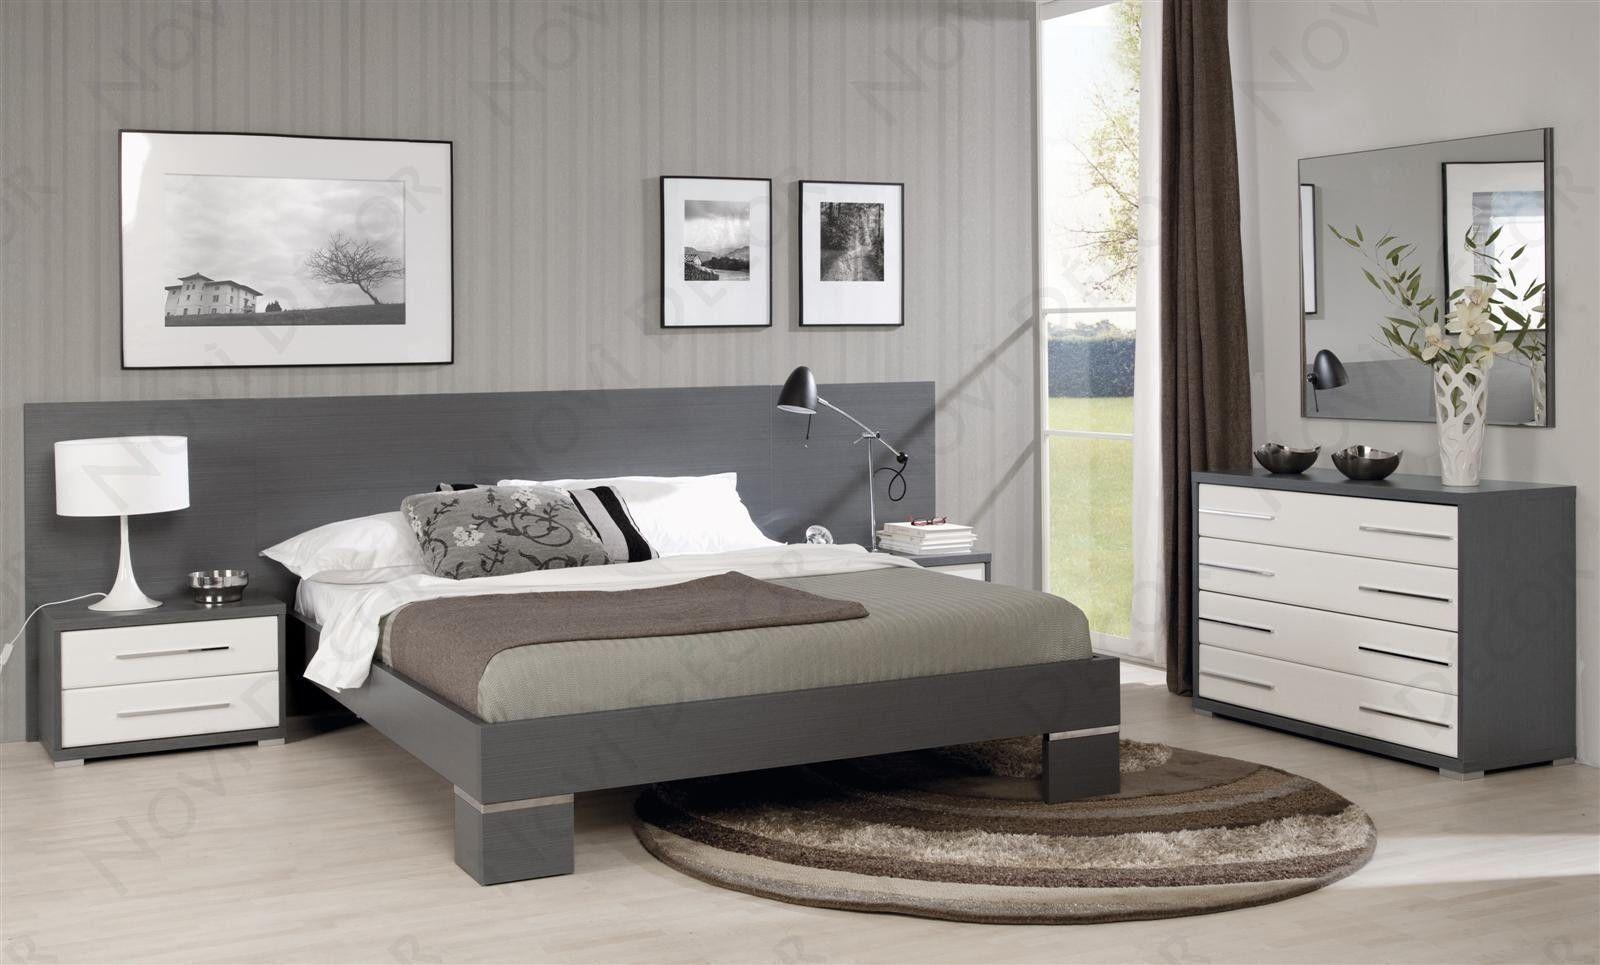 30 Best Photo Of Bedroom Furniture Ideas Bedroom Furniture Ideas